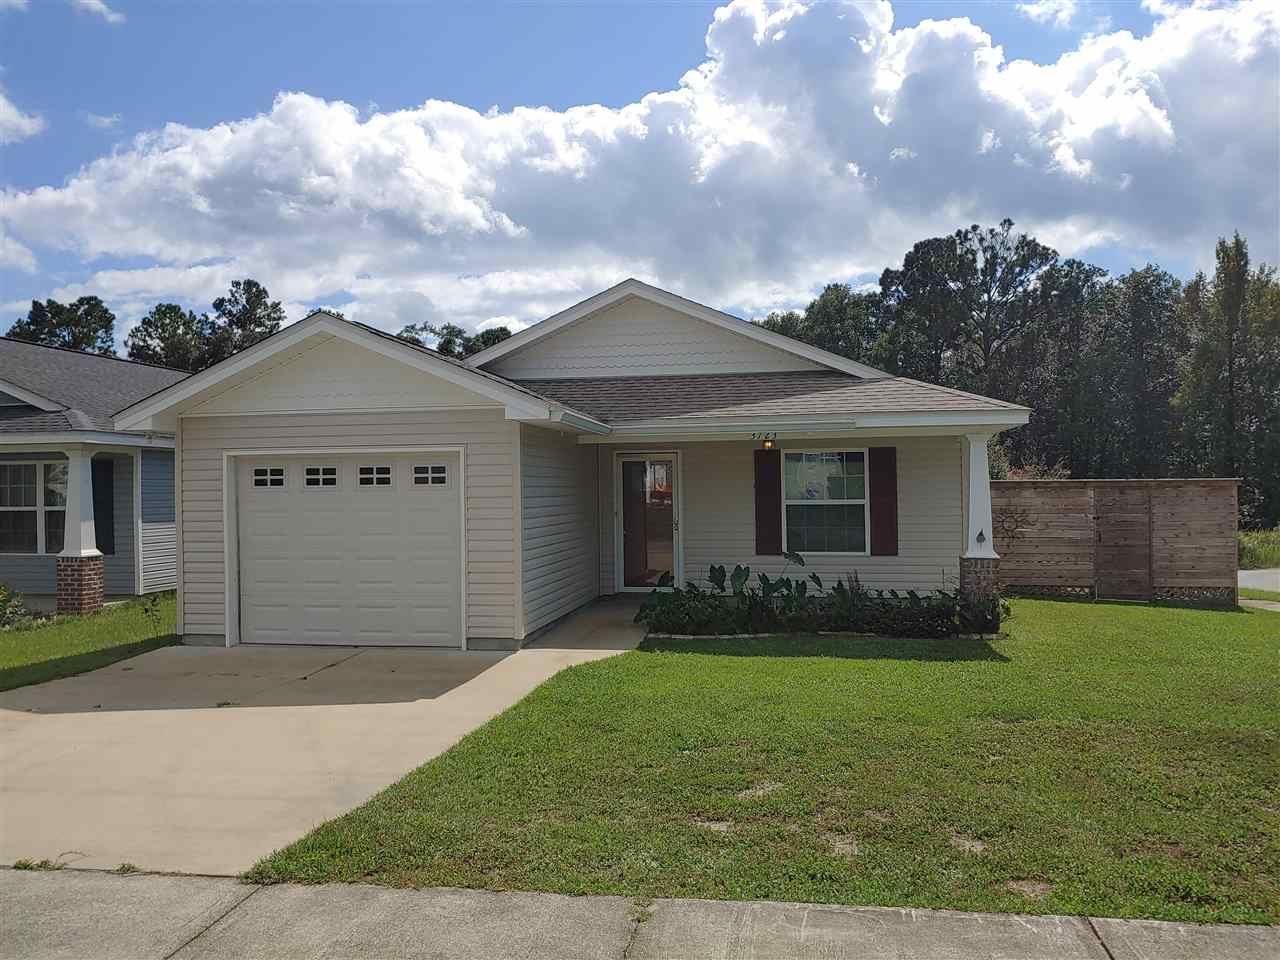 3723 Deshazier Lane, Tallahassee, FL 32303 - MLS#: 324725